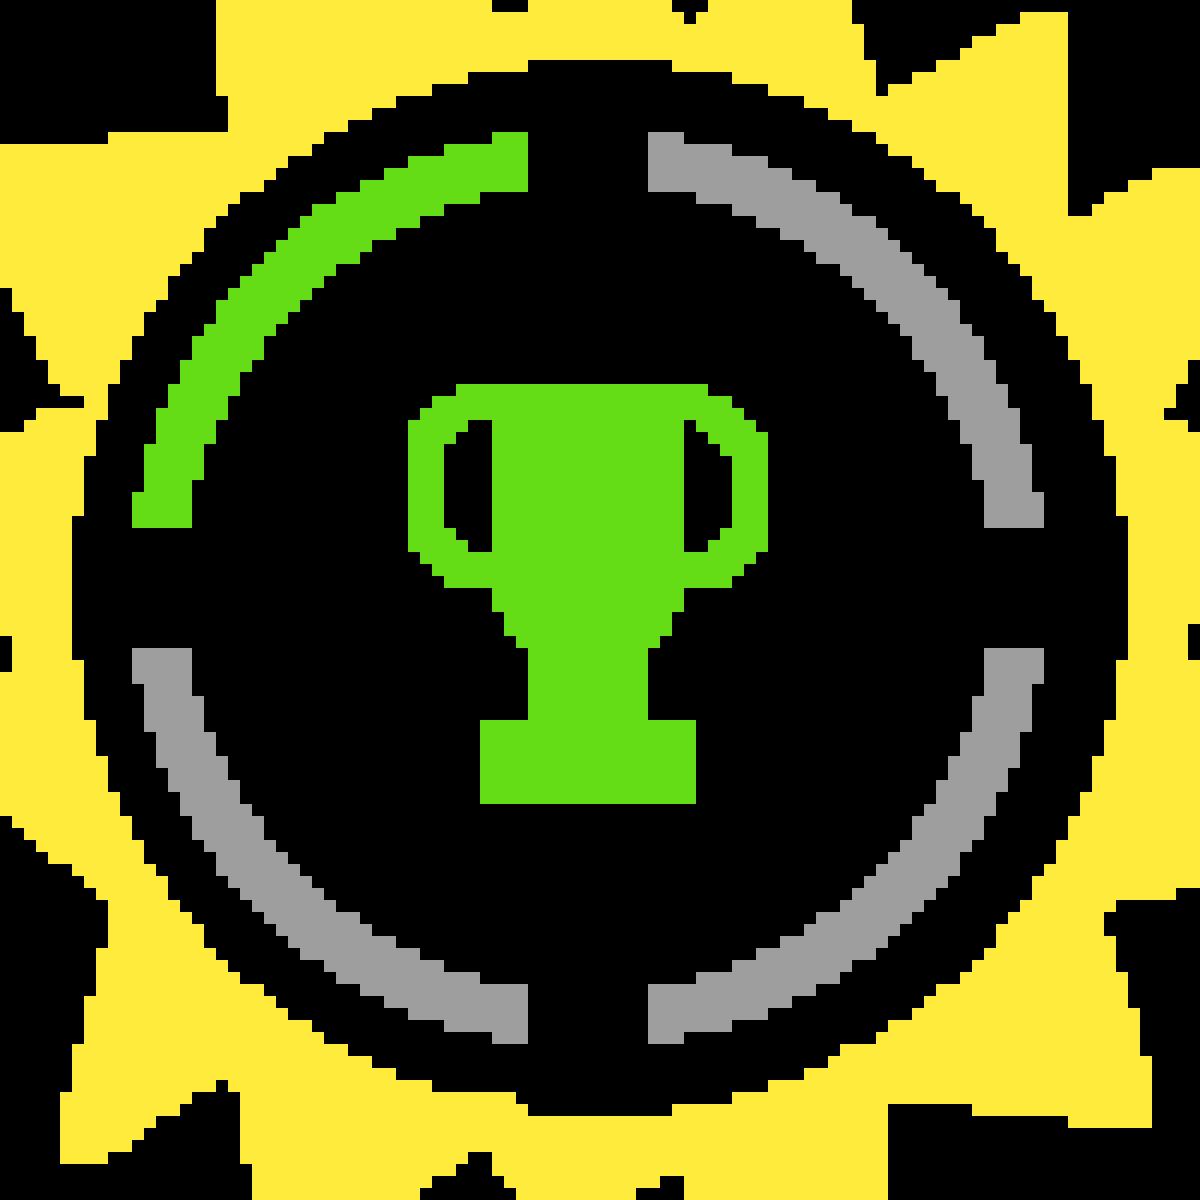 Pixilart Game Theory Logo By Dj Jumpman